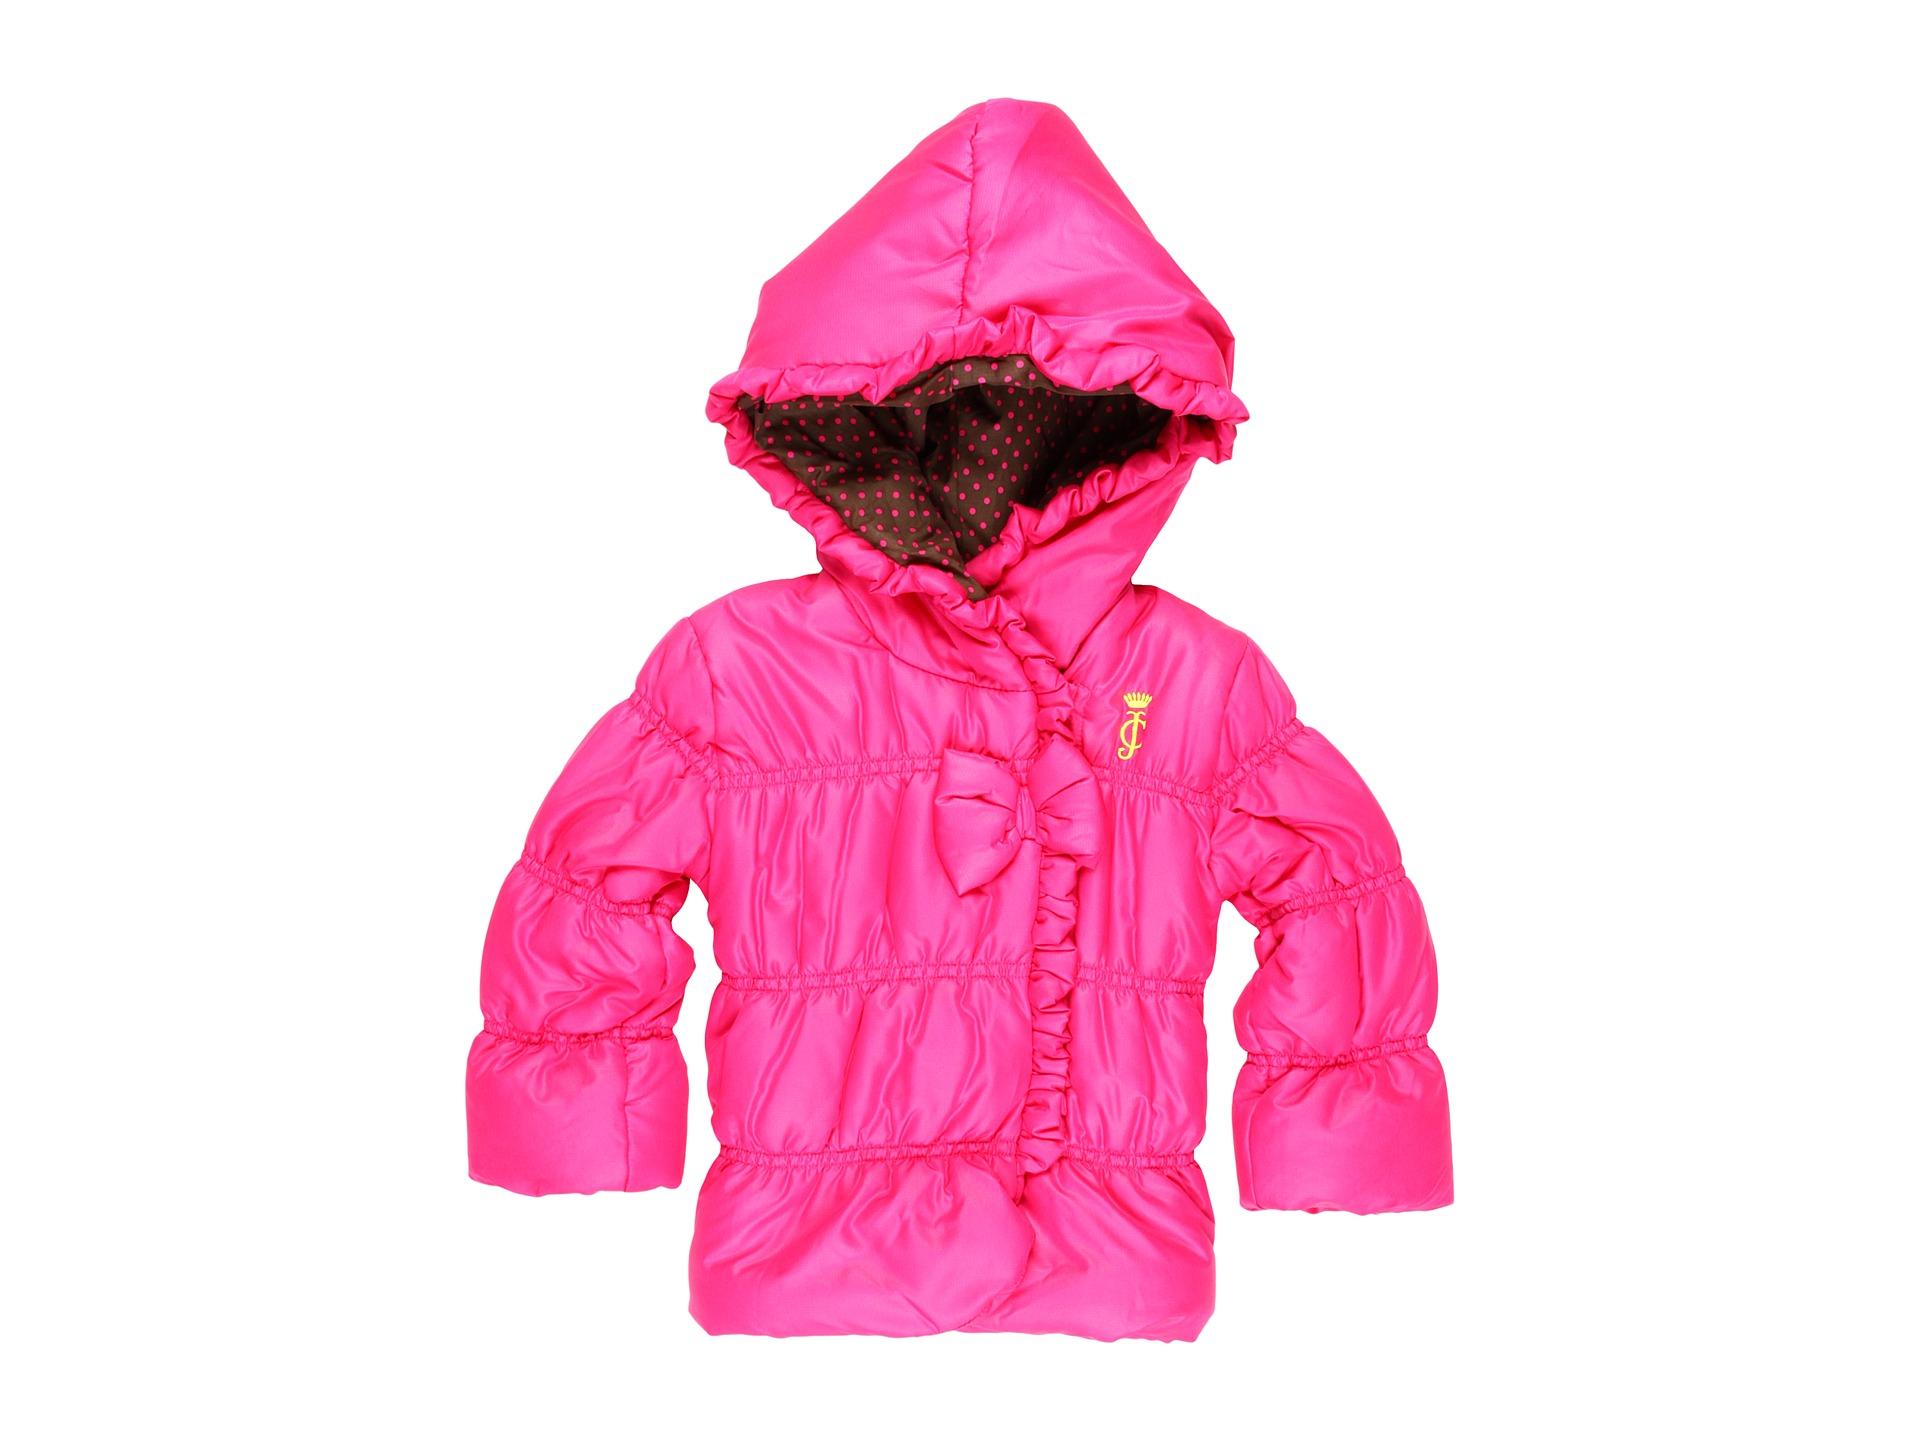 168754de95c6 Juicy Couture Kids Bow Puffer Coat (Infant) on PopScreen